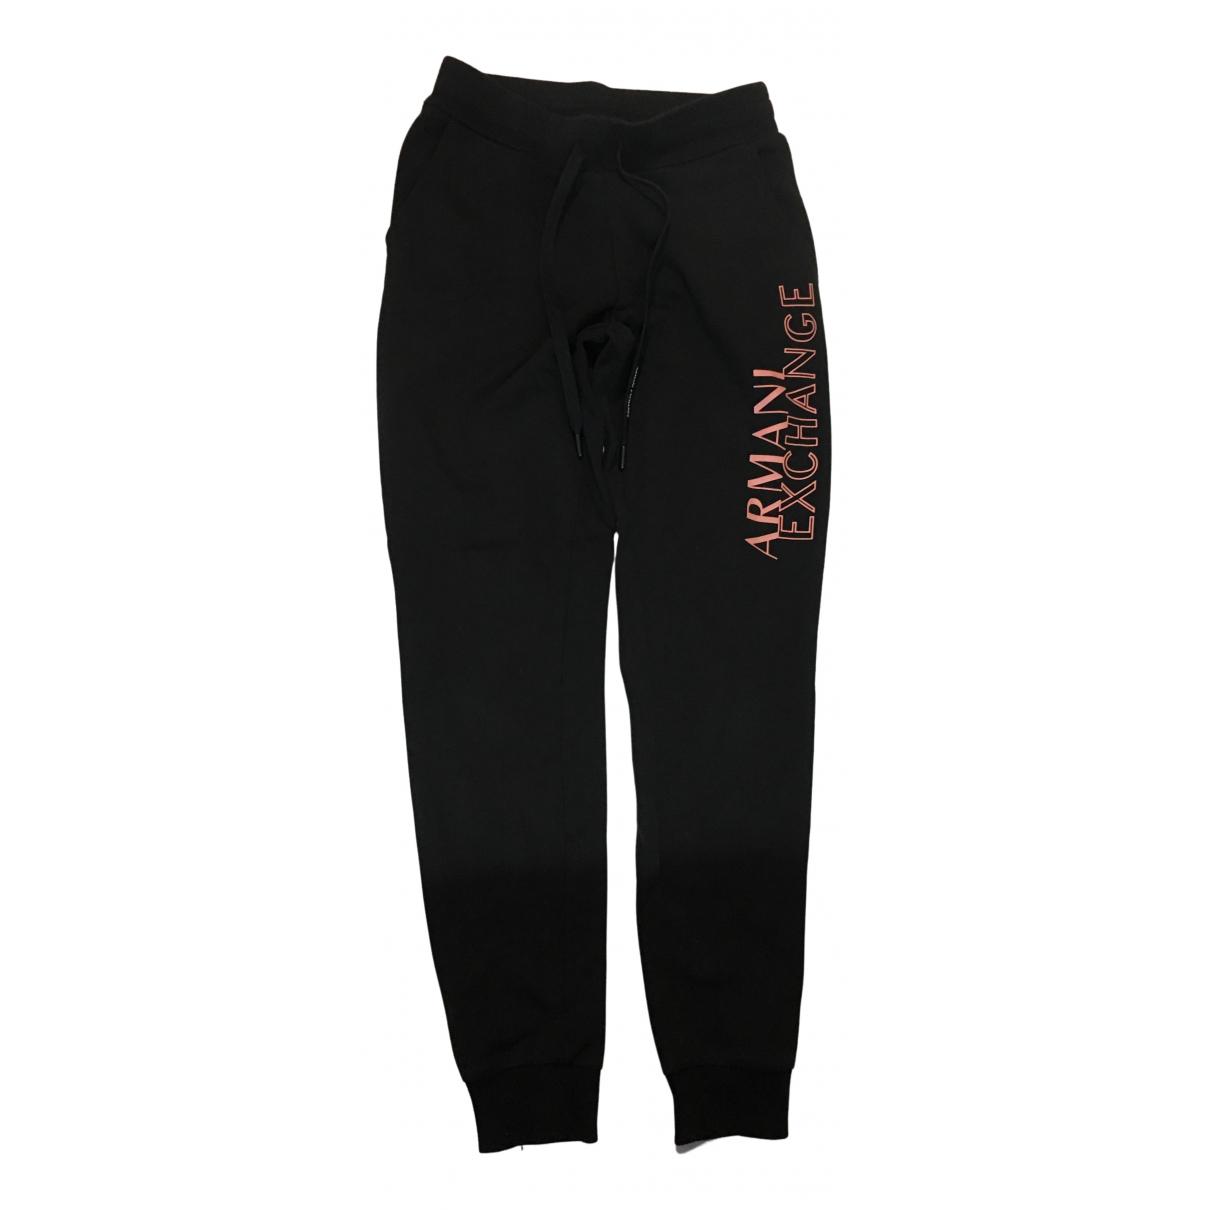 Emporio Armani \N Black Cotton Trousers for Women S International